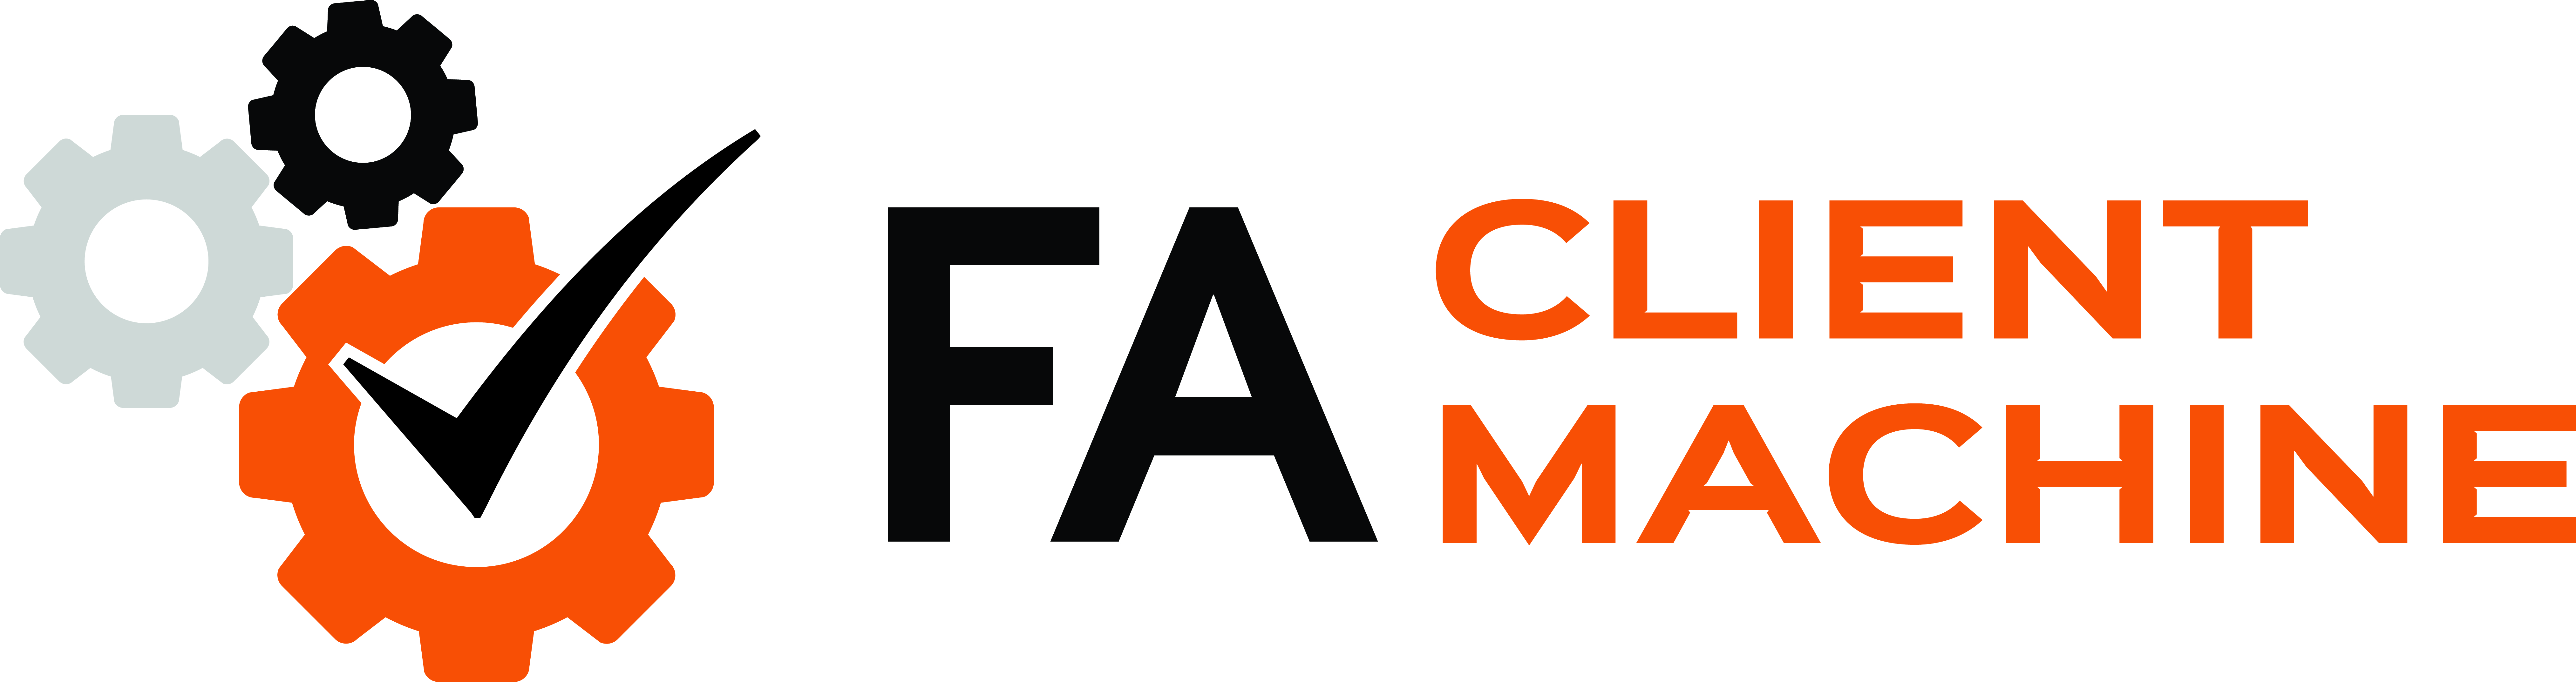 FA Client Machine.jpg